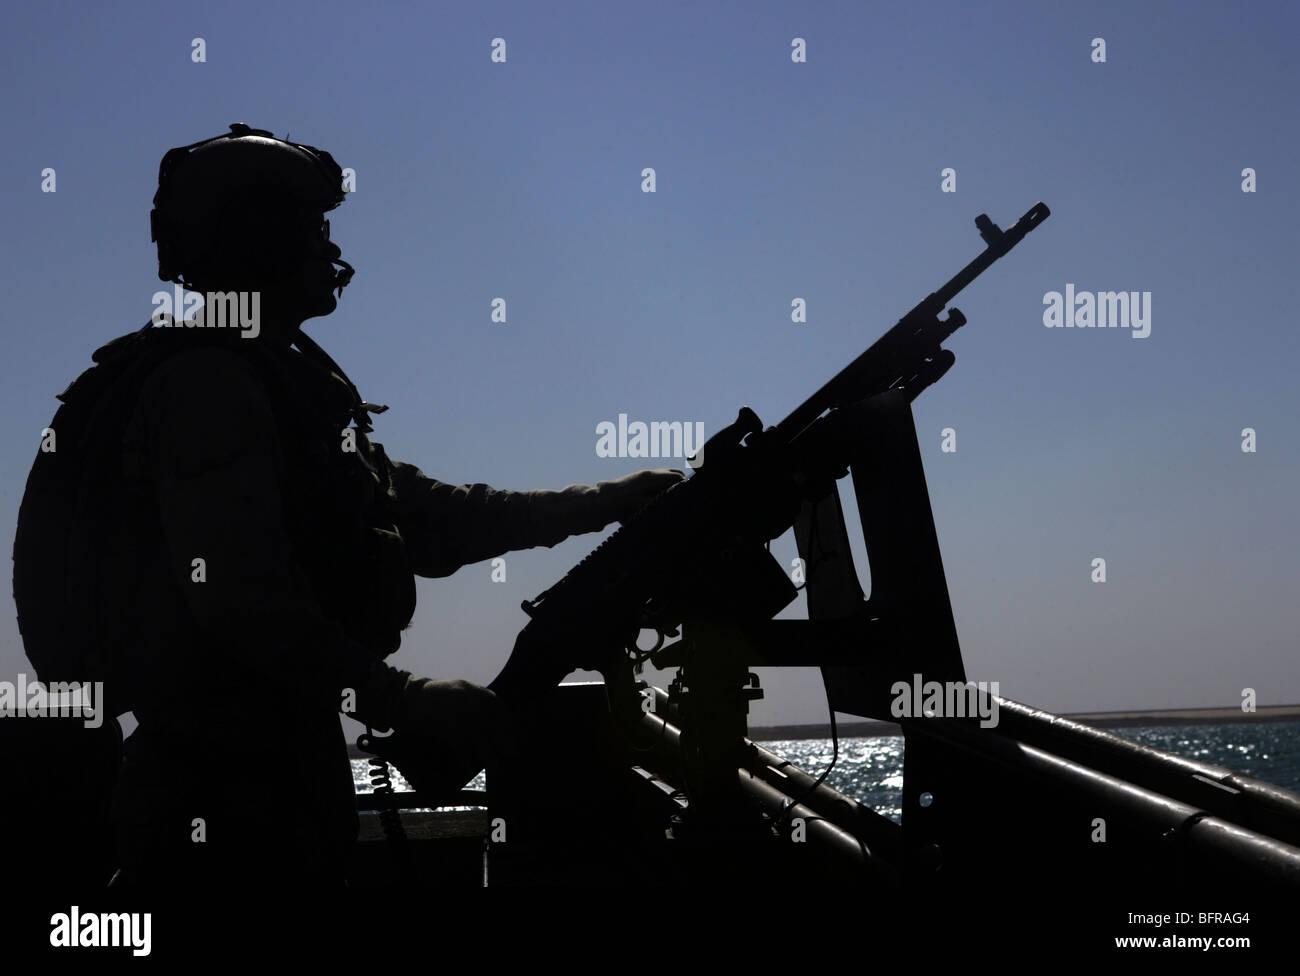 Information Systems Technician manning an M240 machine gun at Lake Quadsiyah near Haditha, Iraq. - Stock Image